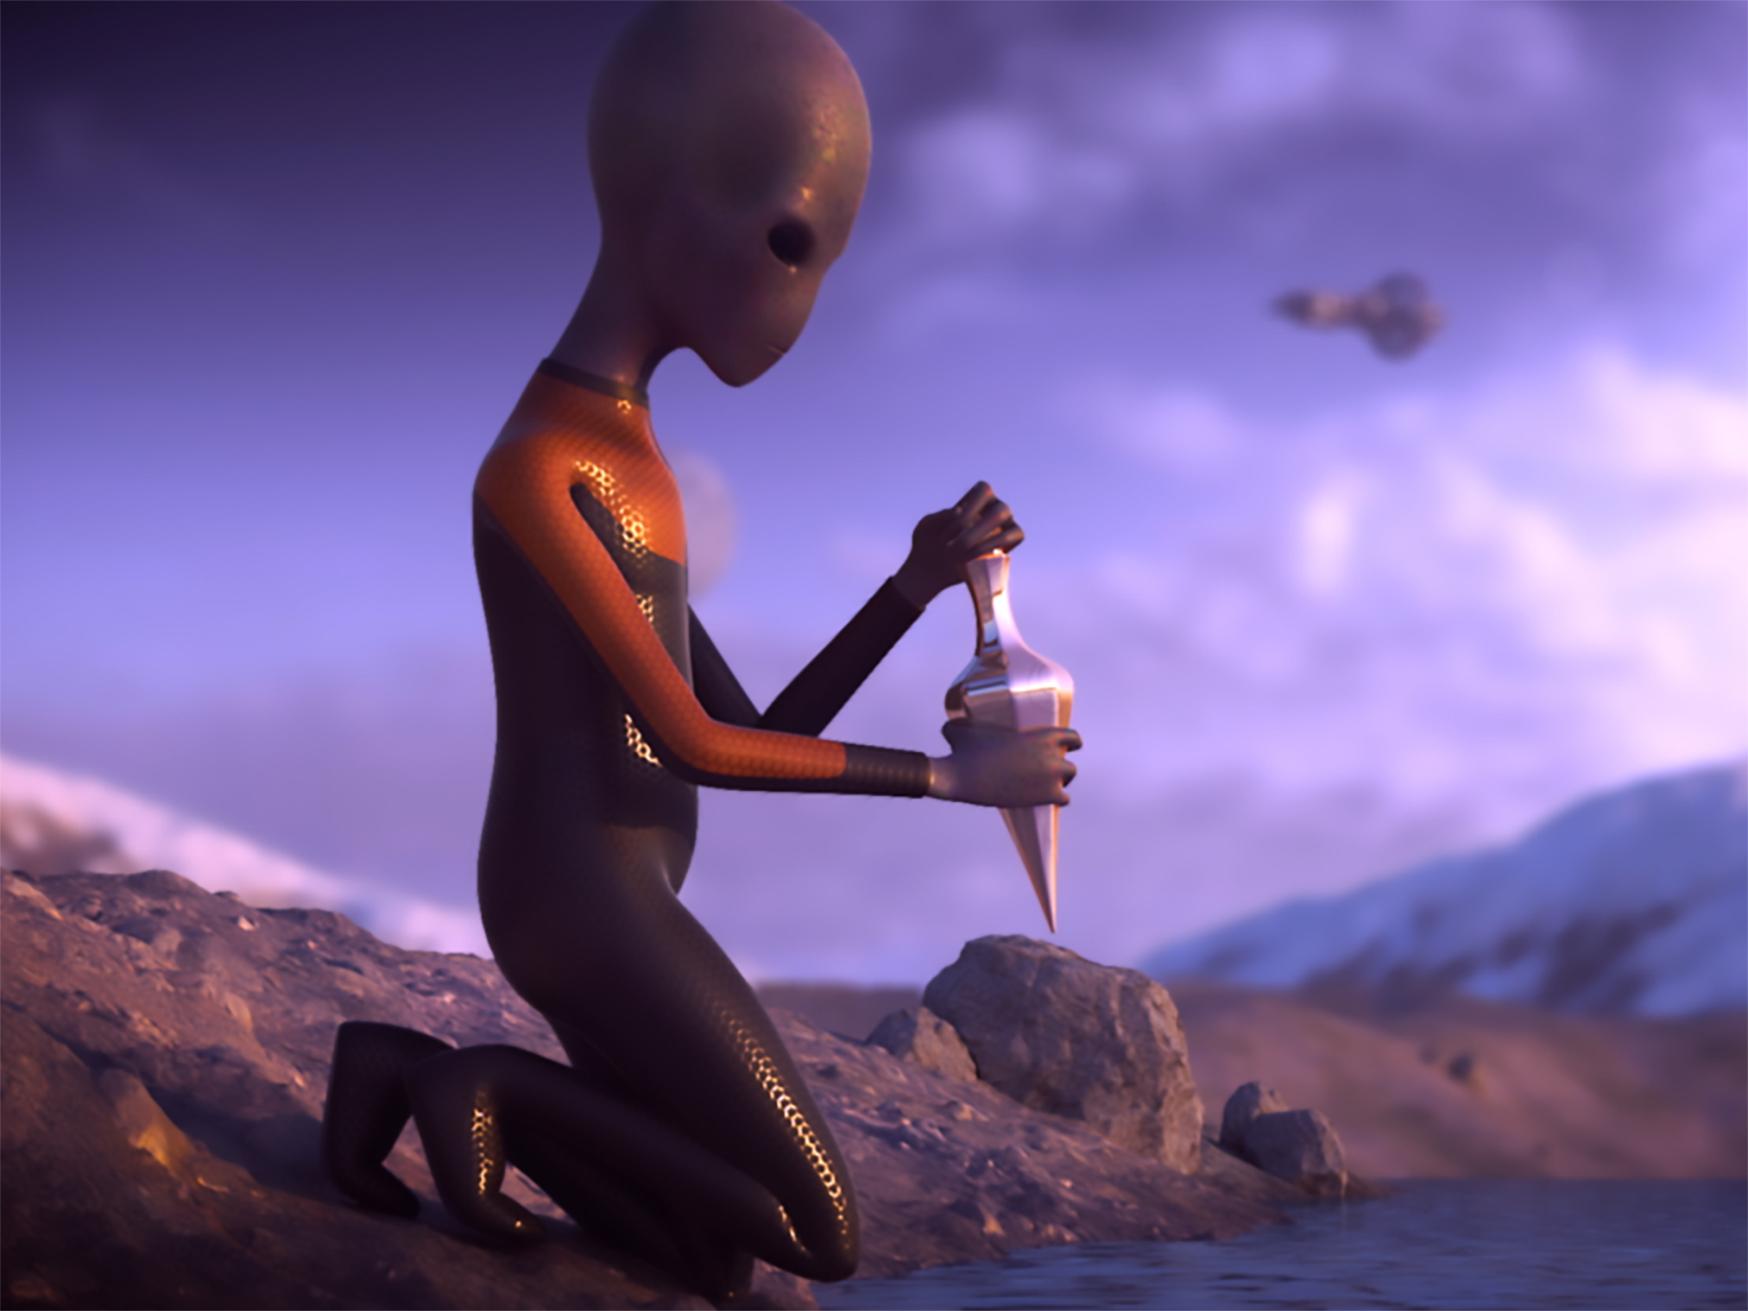 Alien Intrusion - Unmasking a Deception .jpg